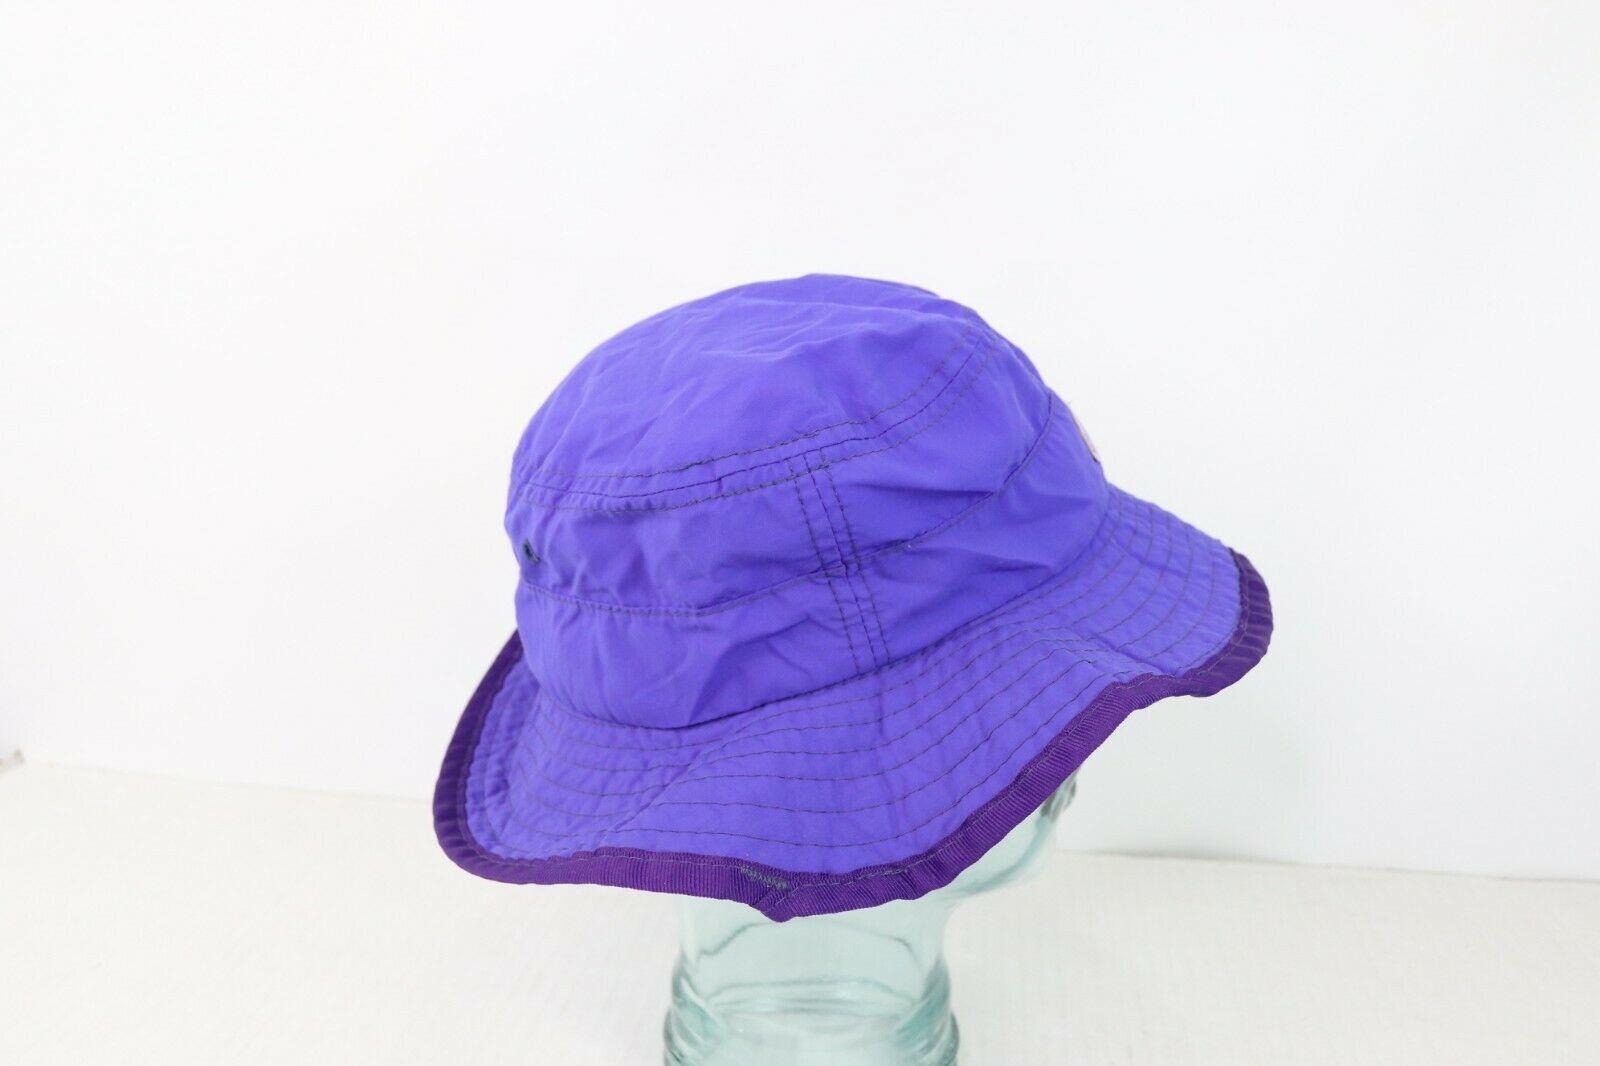 Vintage 90s Columbia Unisex Medium Spell Out Boonie Bucket Hat Cap Purple USA